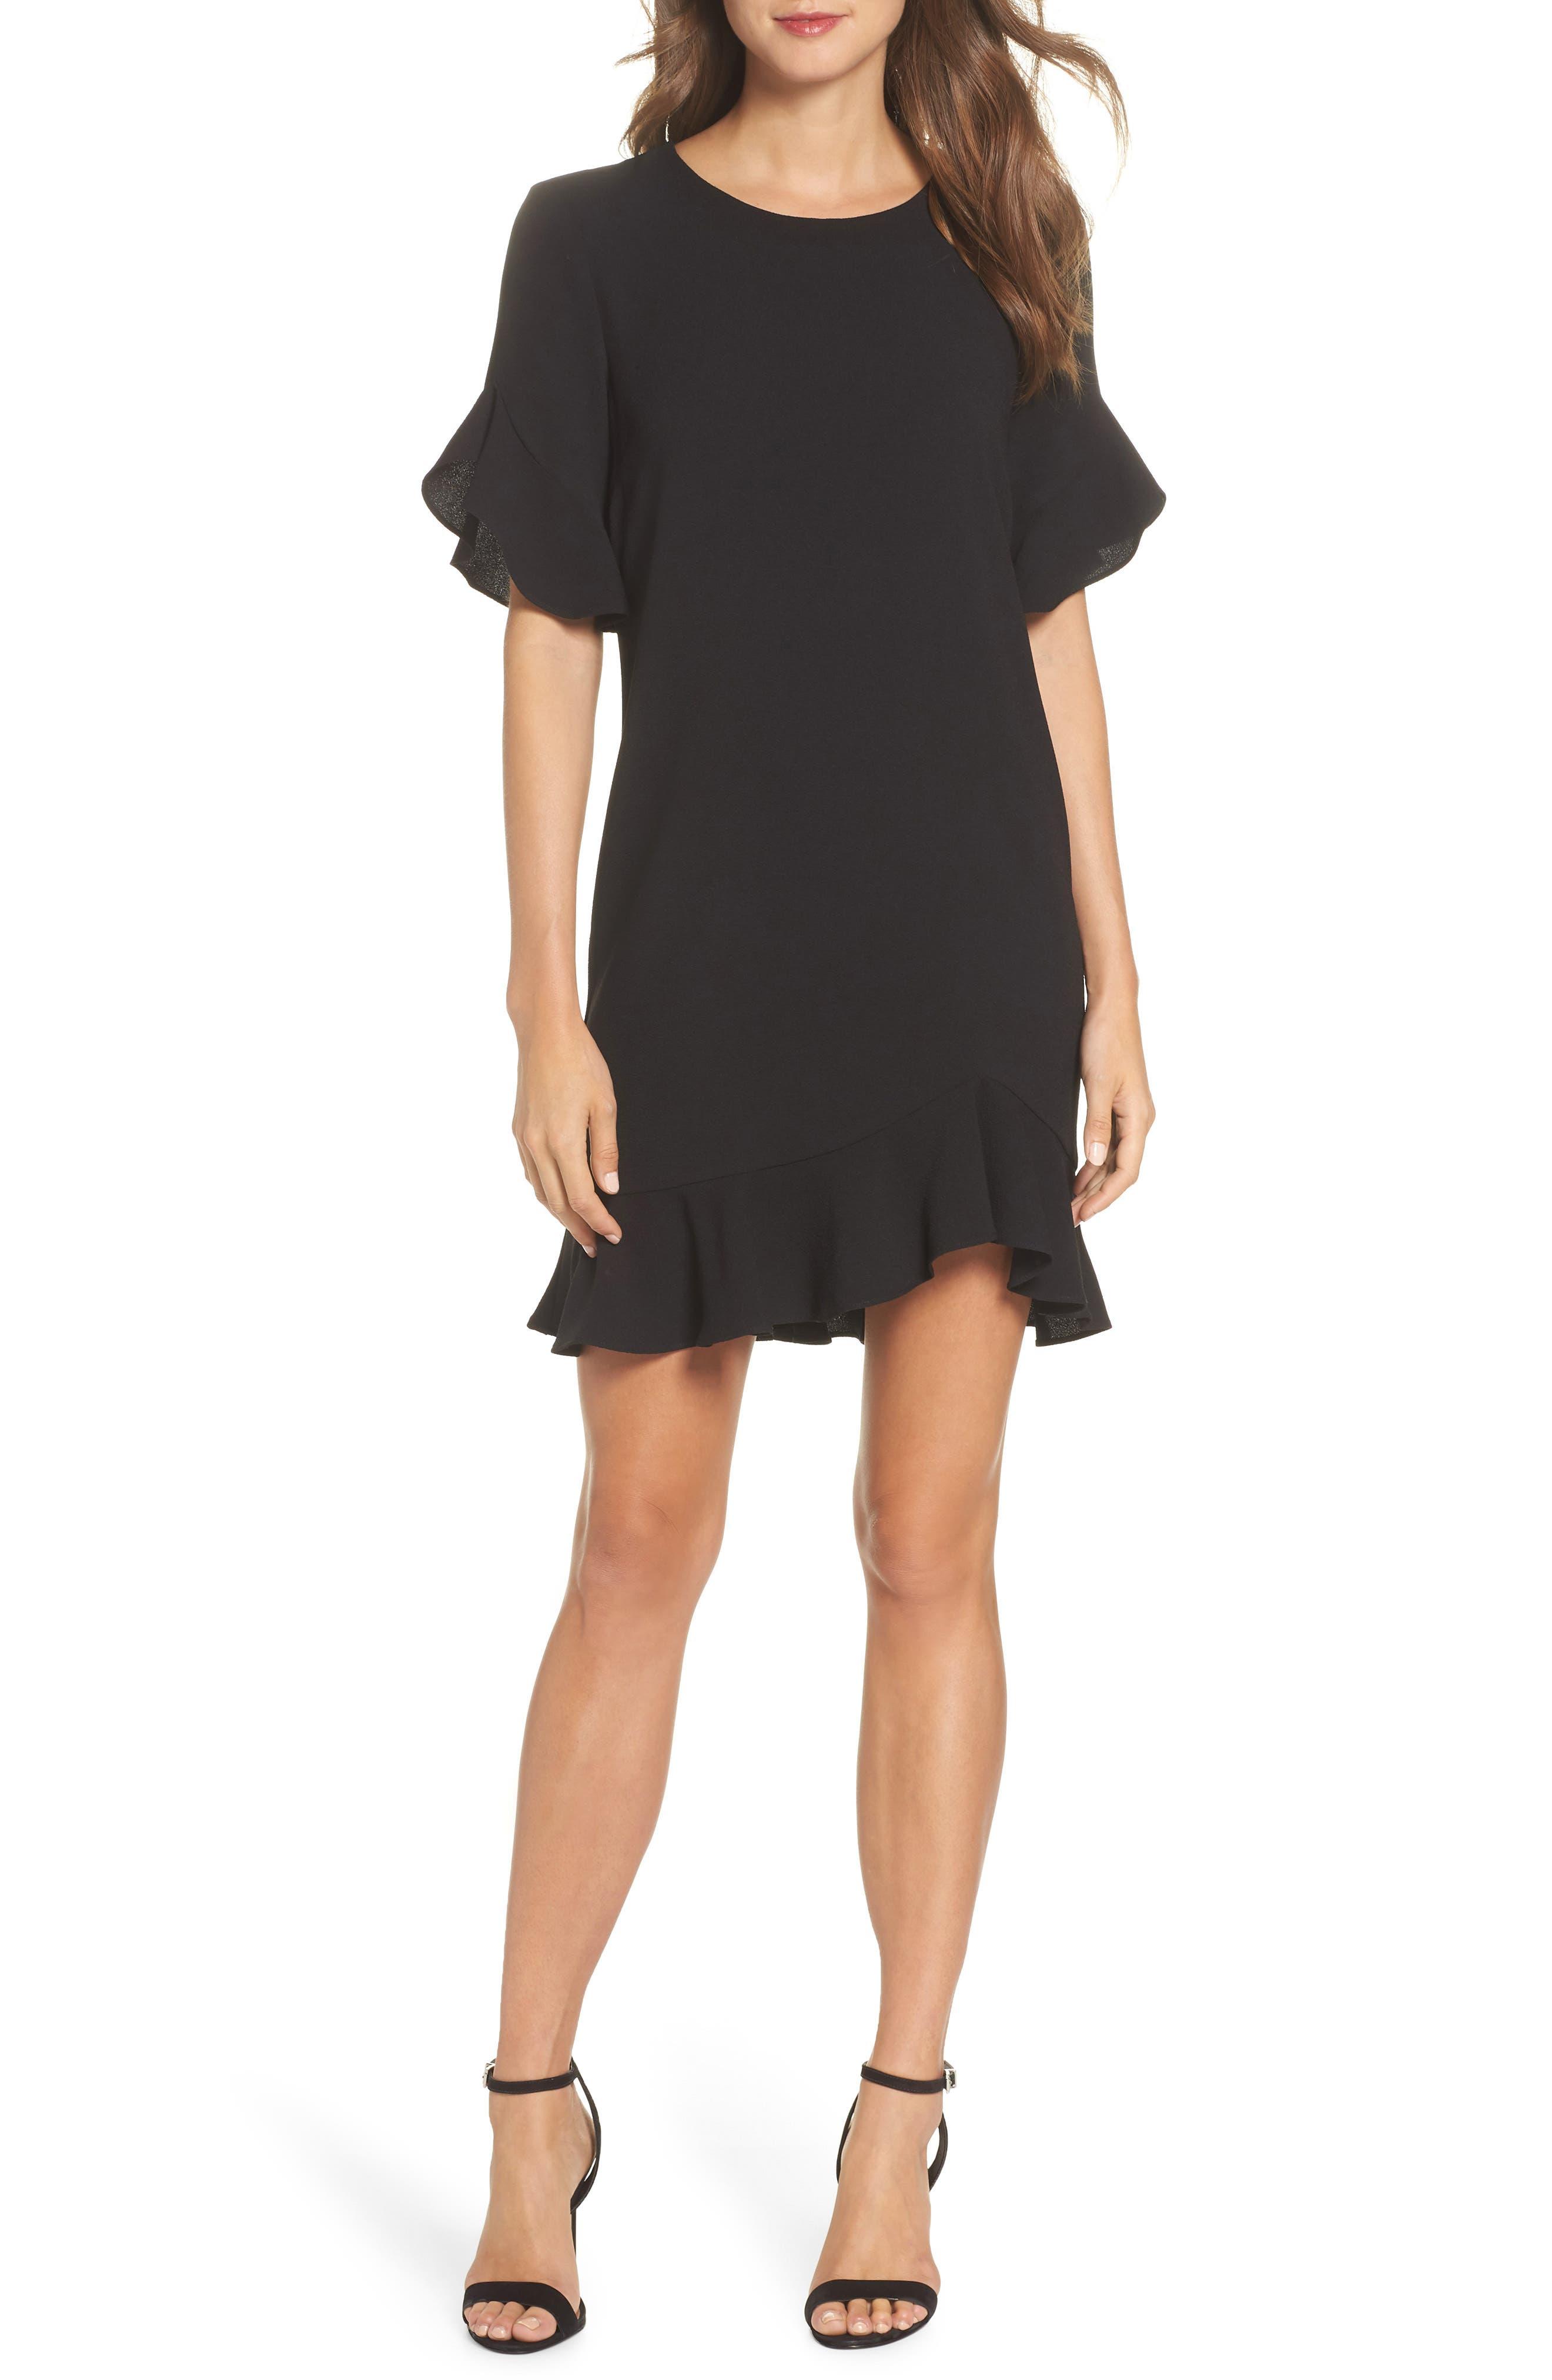 CHARLES HENRY RUFFLE DETAIL SHIFT DRESS